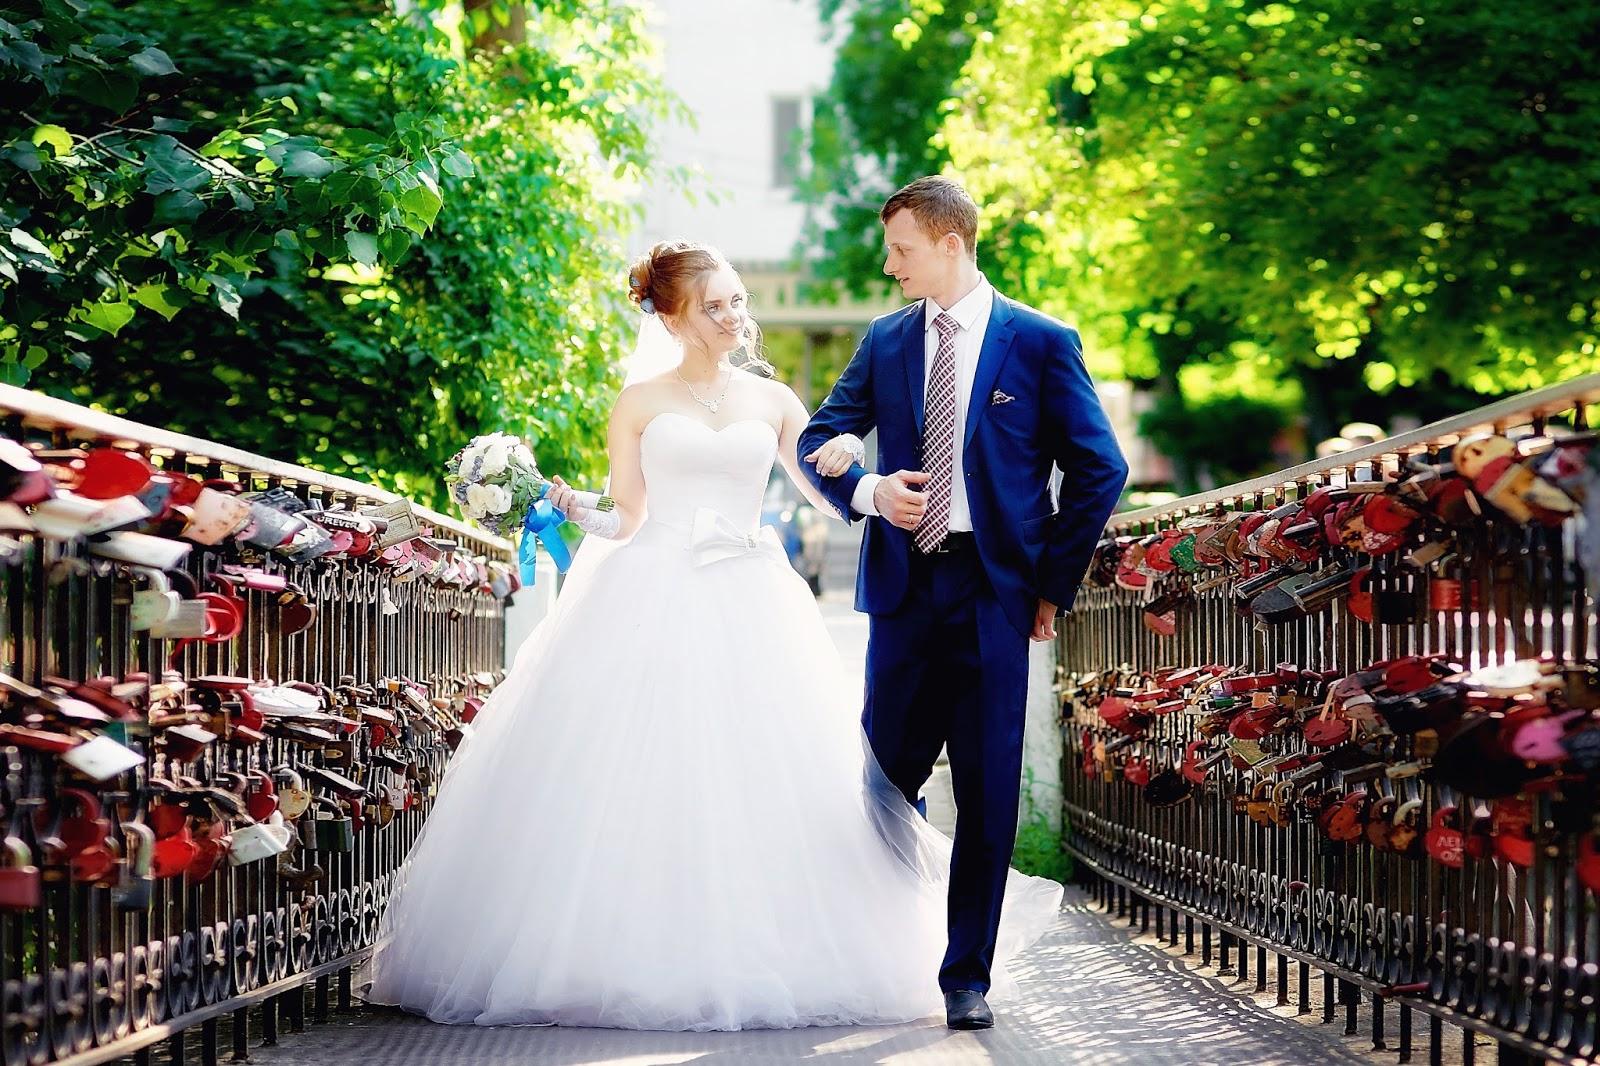 Фото и видеосъемка свадьбы в ростове